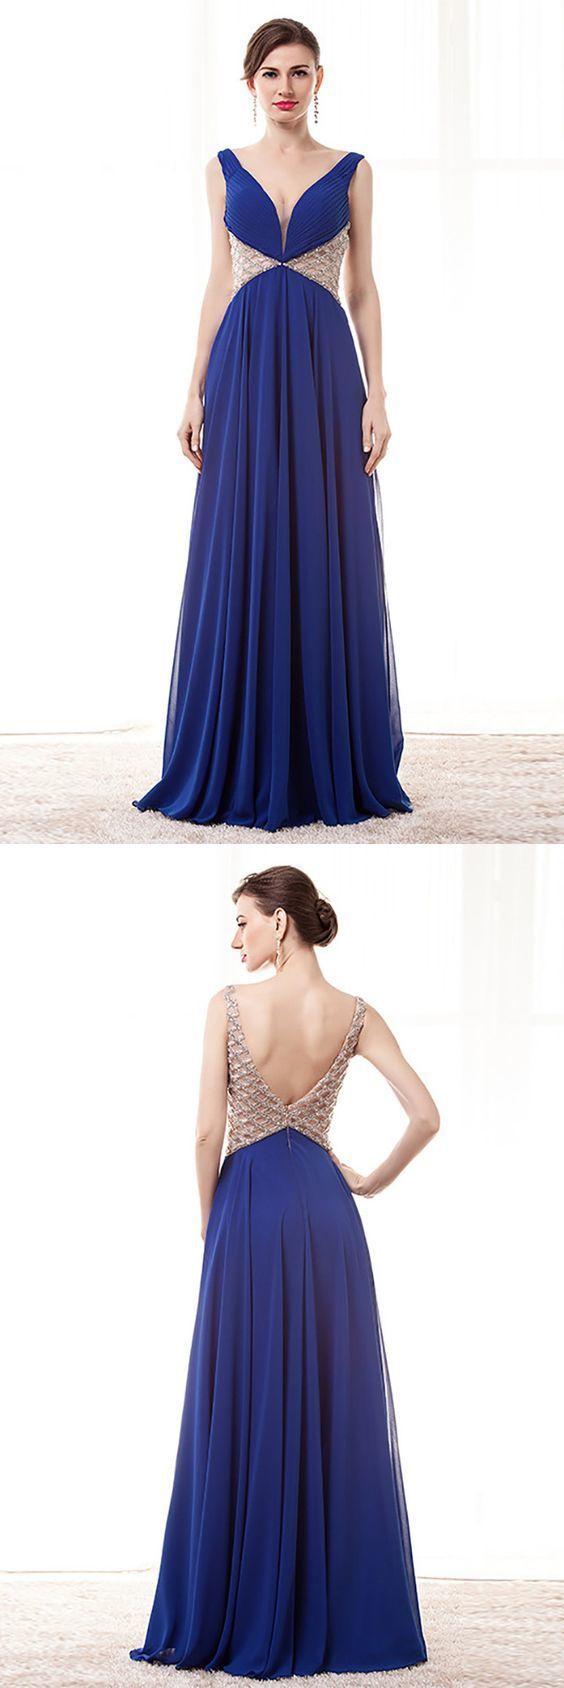 Open Back V-neck Blue Prom Dress Long With Beading Waist Straps